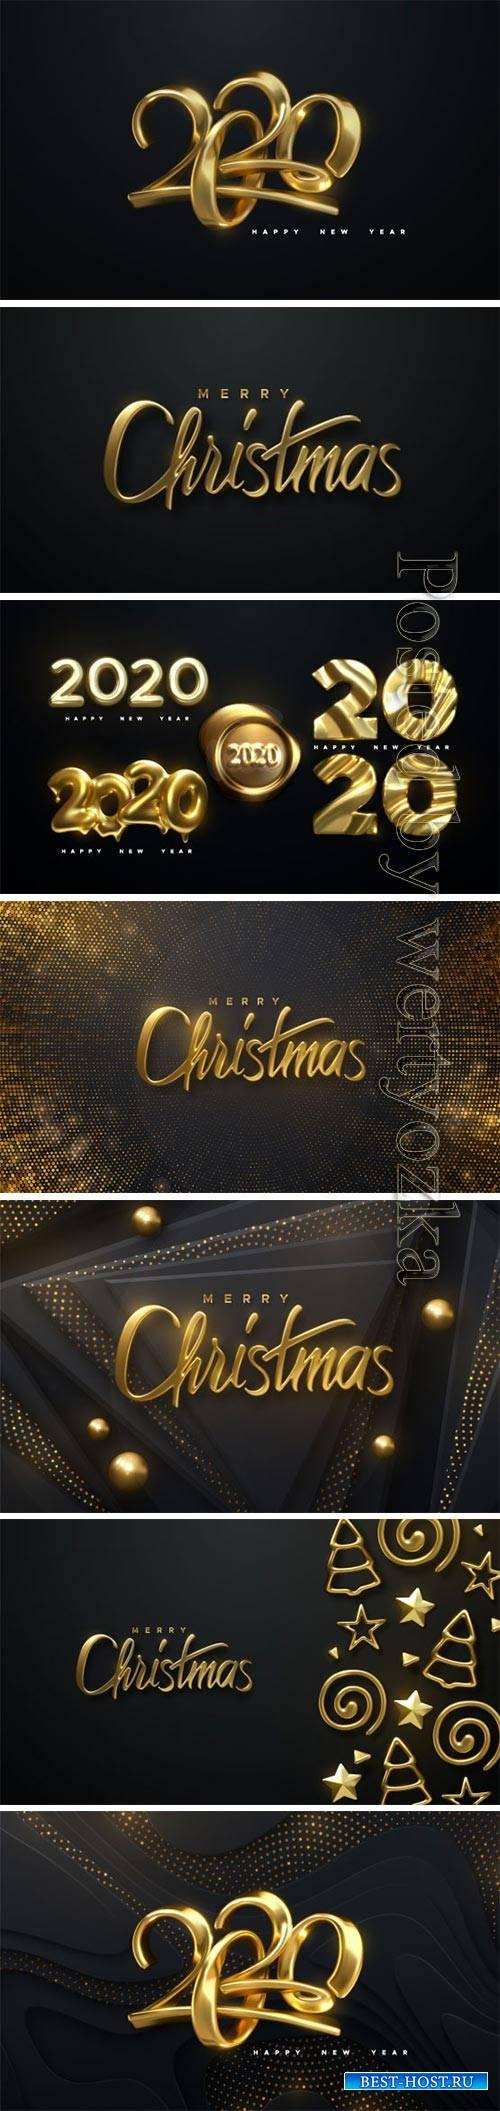 Happy New Year 2020 holiday vector illustration